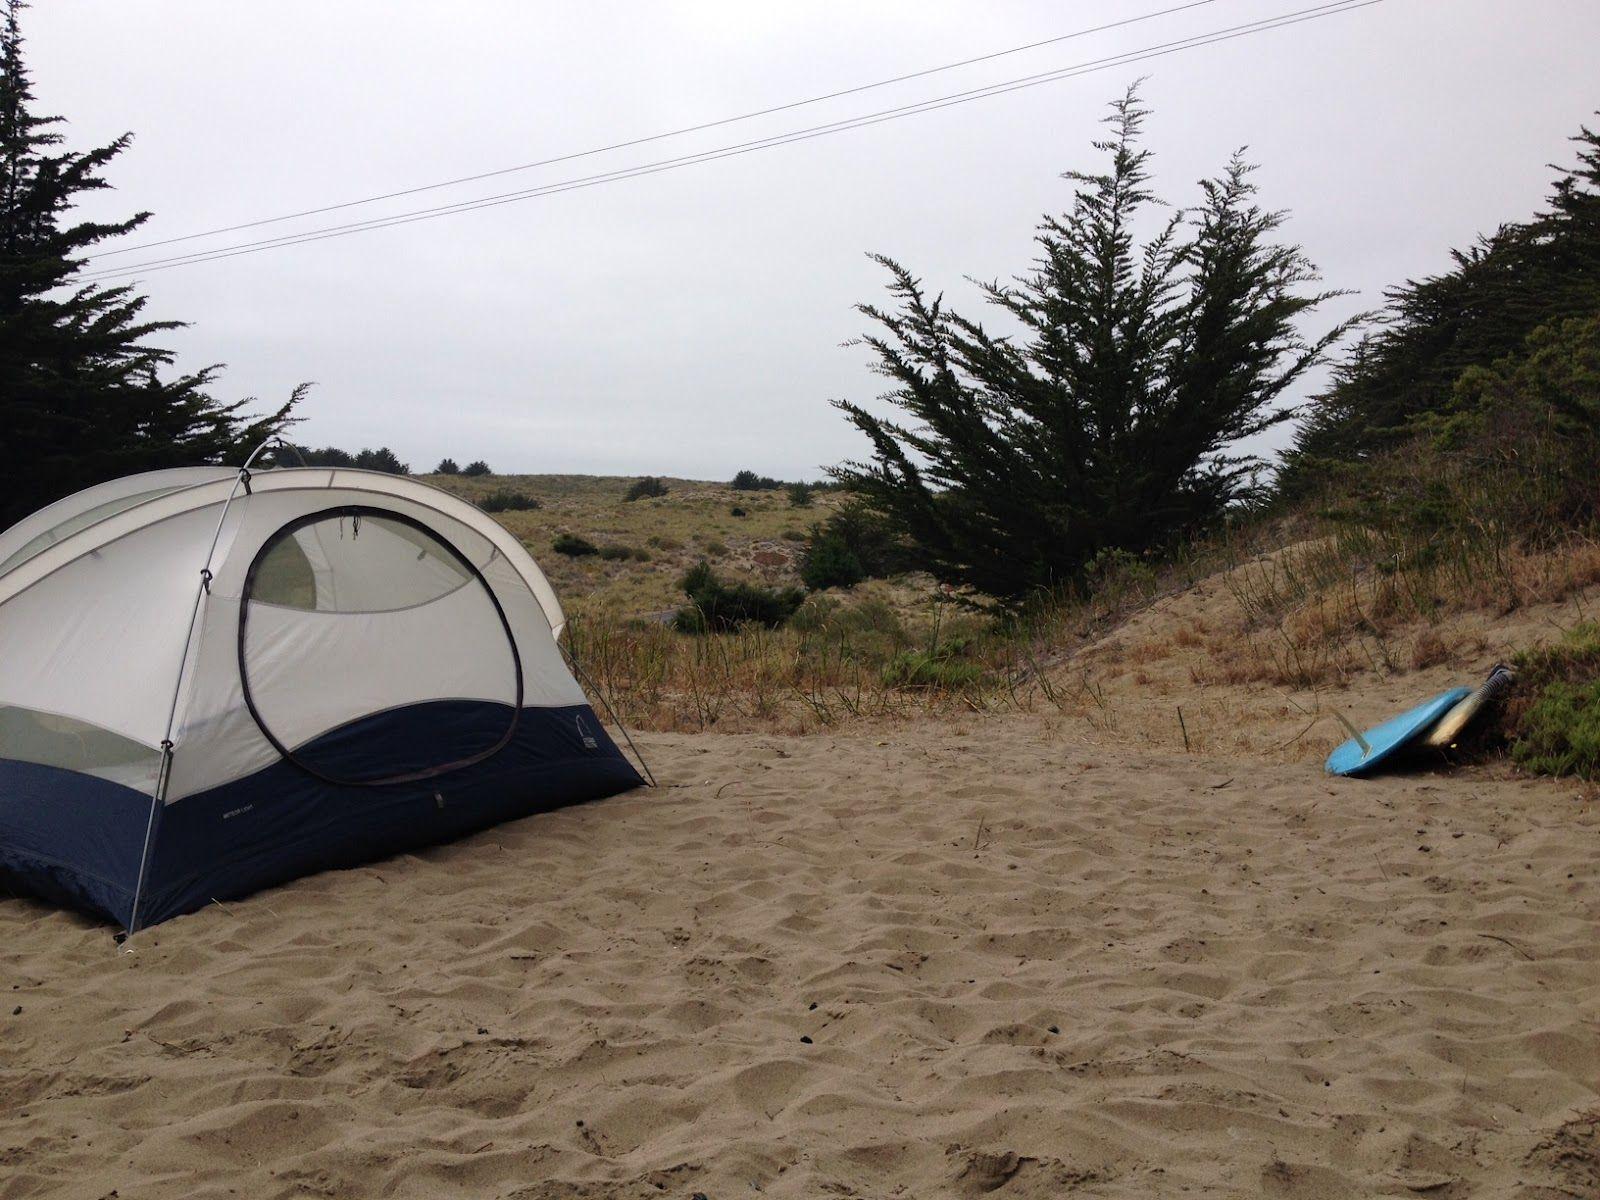 Beau Bodega Dunes Campground, Bodega Bay, CA